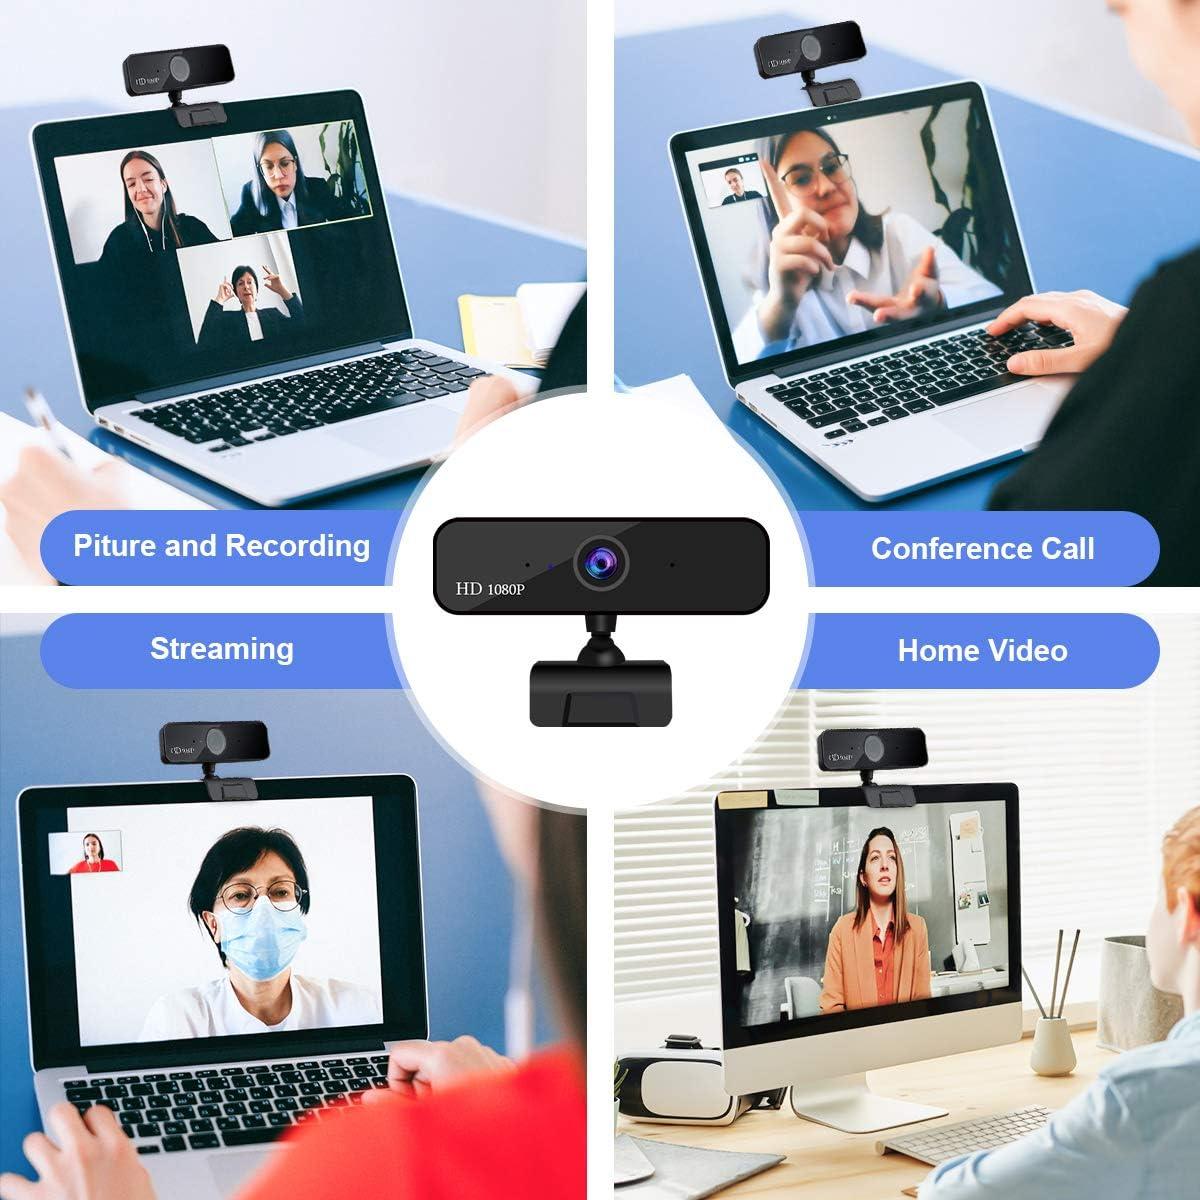 Aufnahme Guo duo Webcam 1080P HD Pro Stream Video Autofokus Streaming Conferencing Digitale Webkamera Video mit Mic USB Widescreen f/ür PC Laptops und Desktop